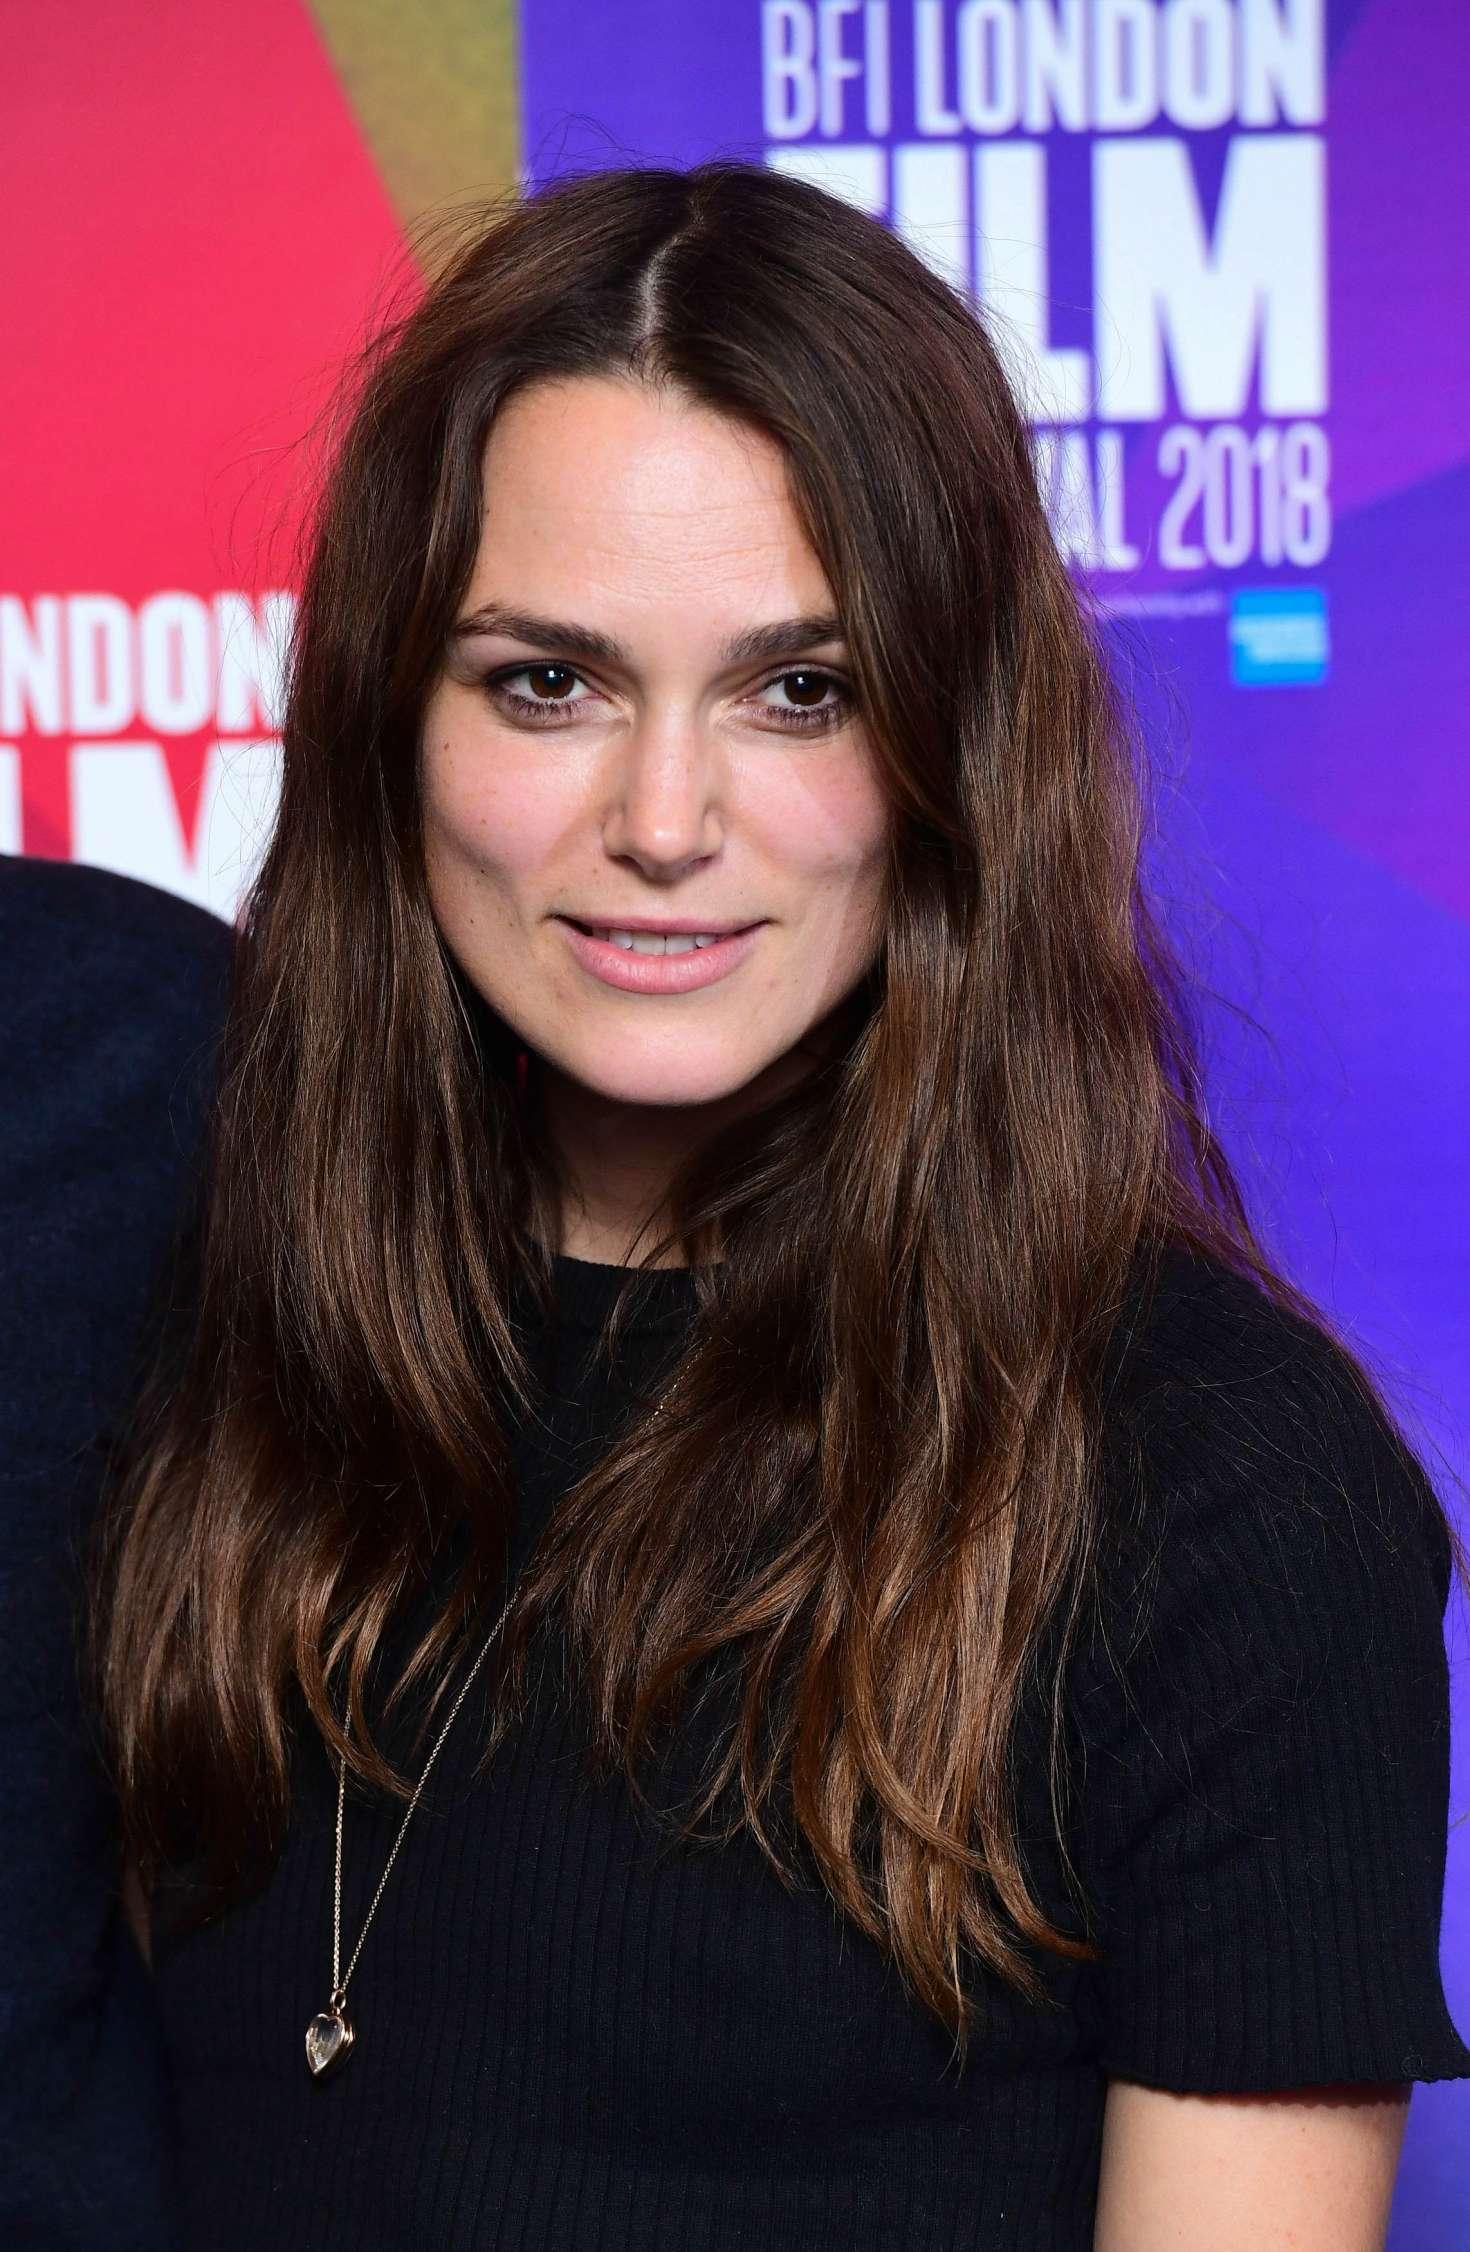 Keira Knightley - 'Benjamin' Premiere at 2018 BFI London Film Festival